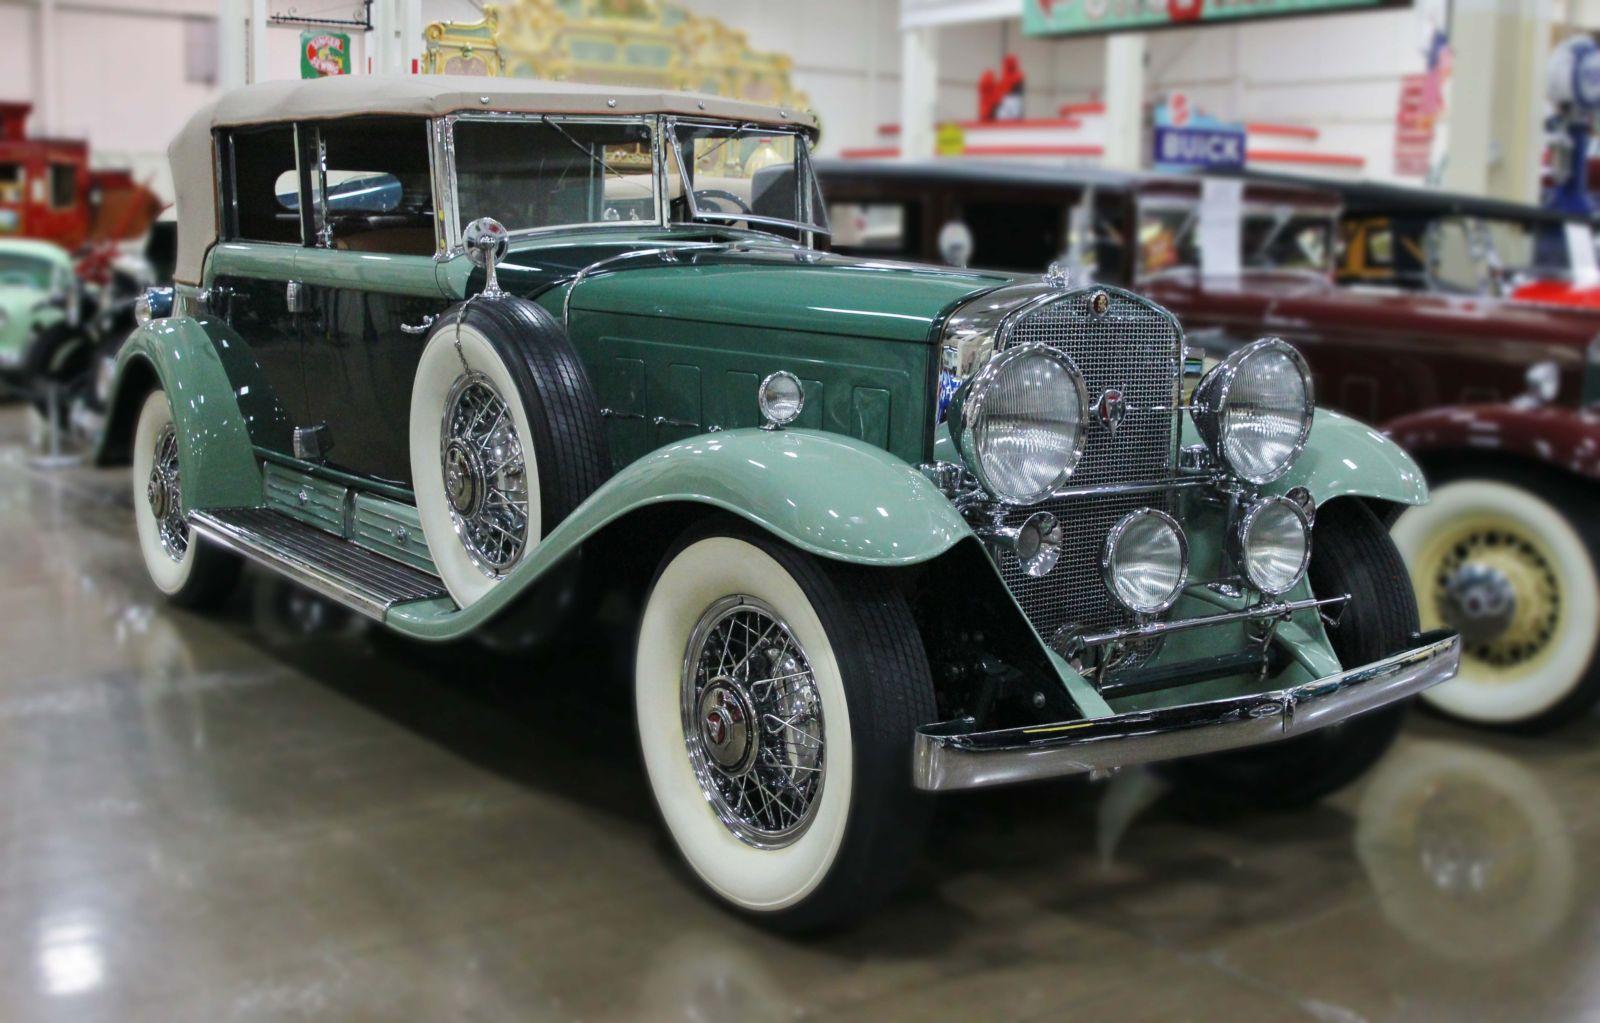 1930 Cadillac V16 Phaeton Series 452 Stahls Automotive